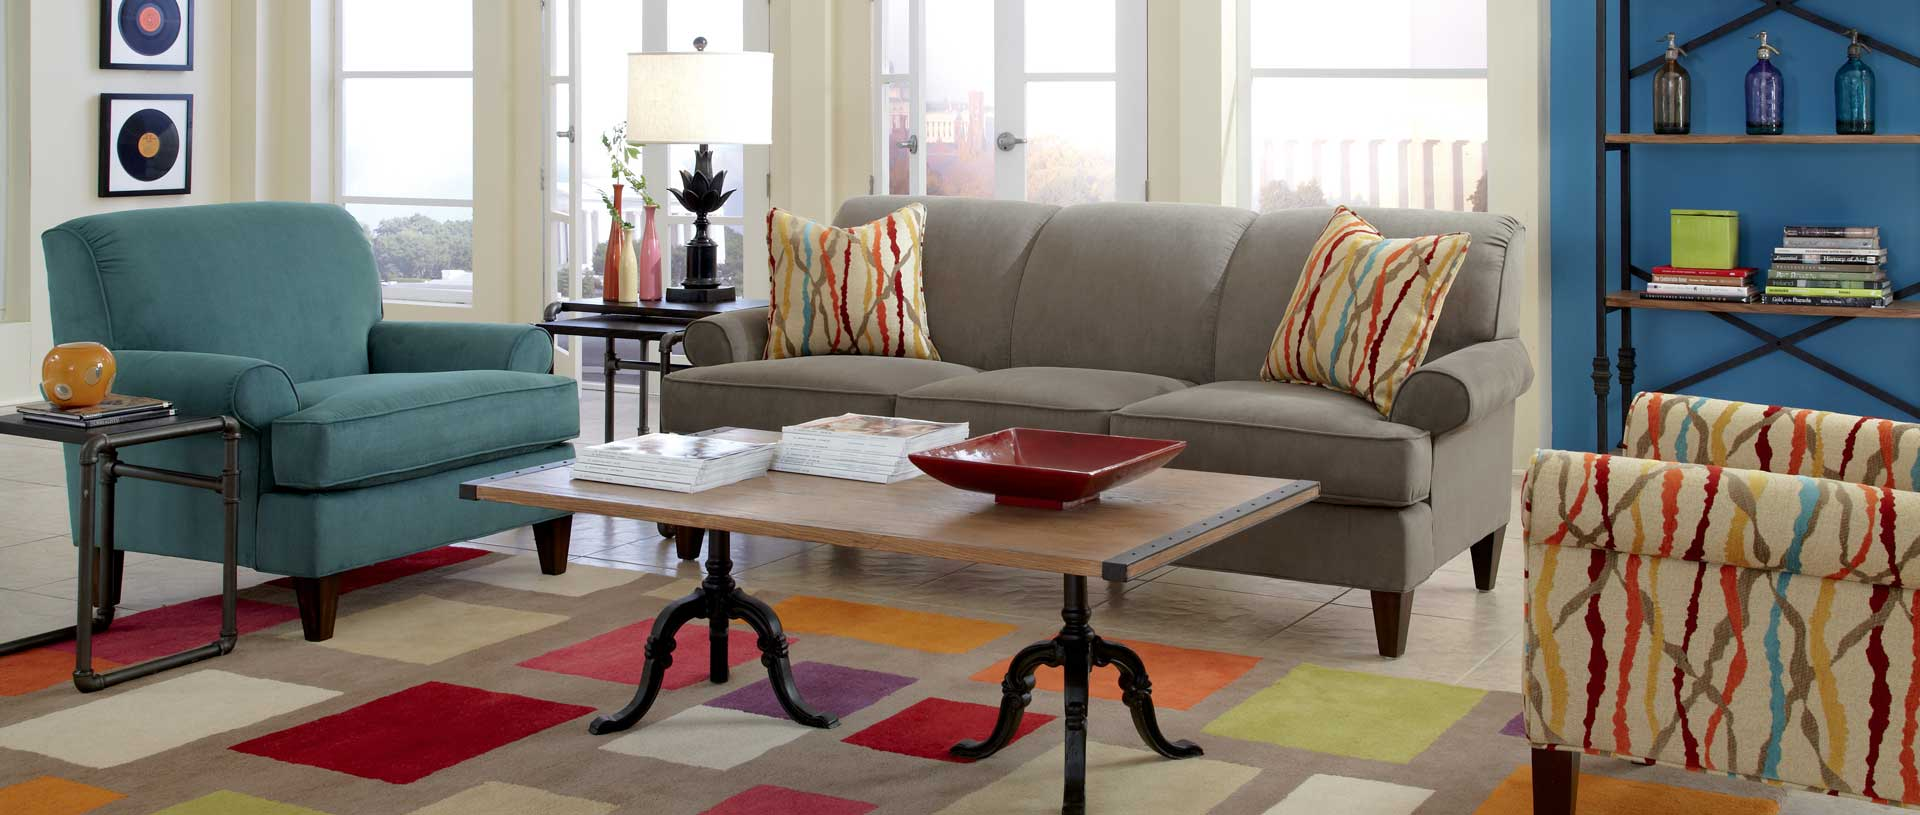 Furniture Store Bangor, Maine, Living Room, Dining Room ... - photo#13